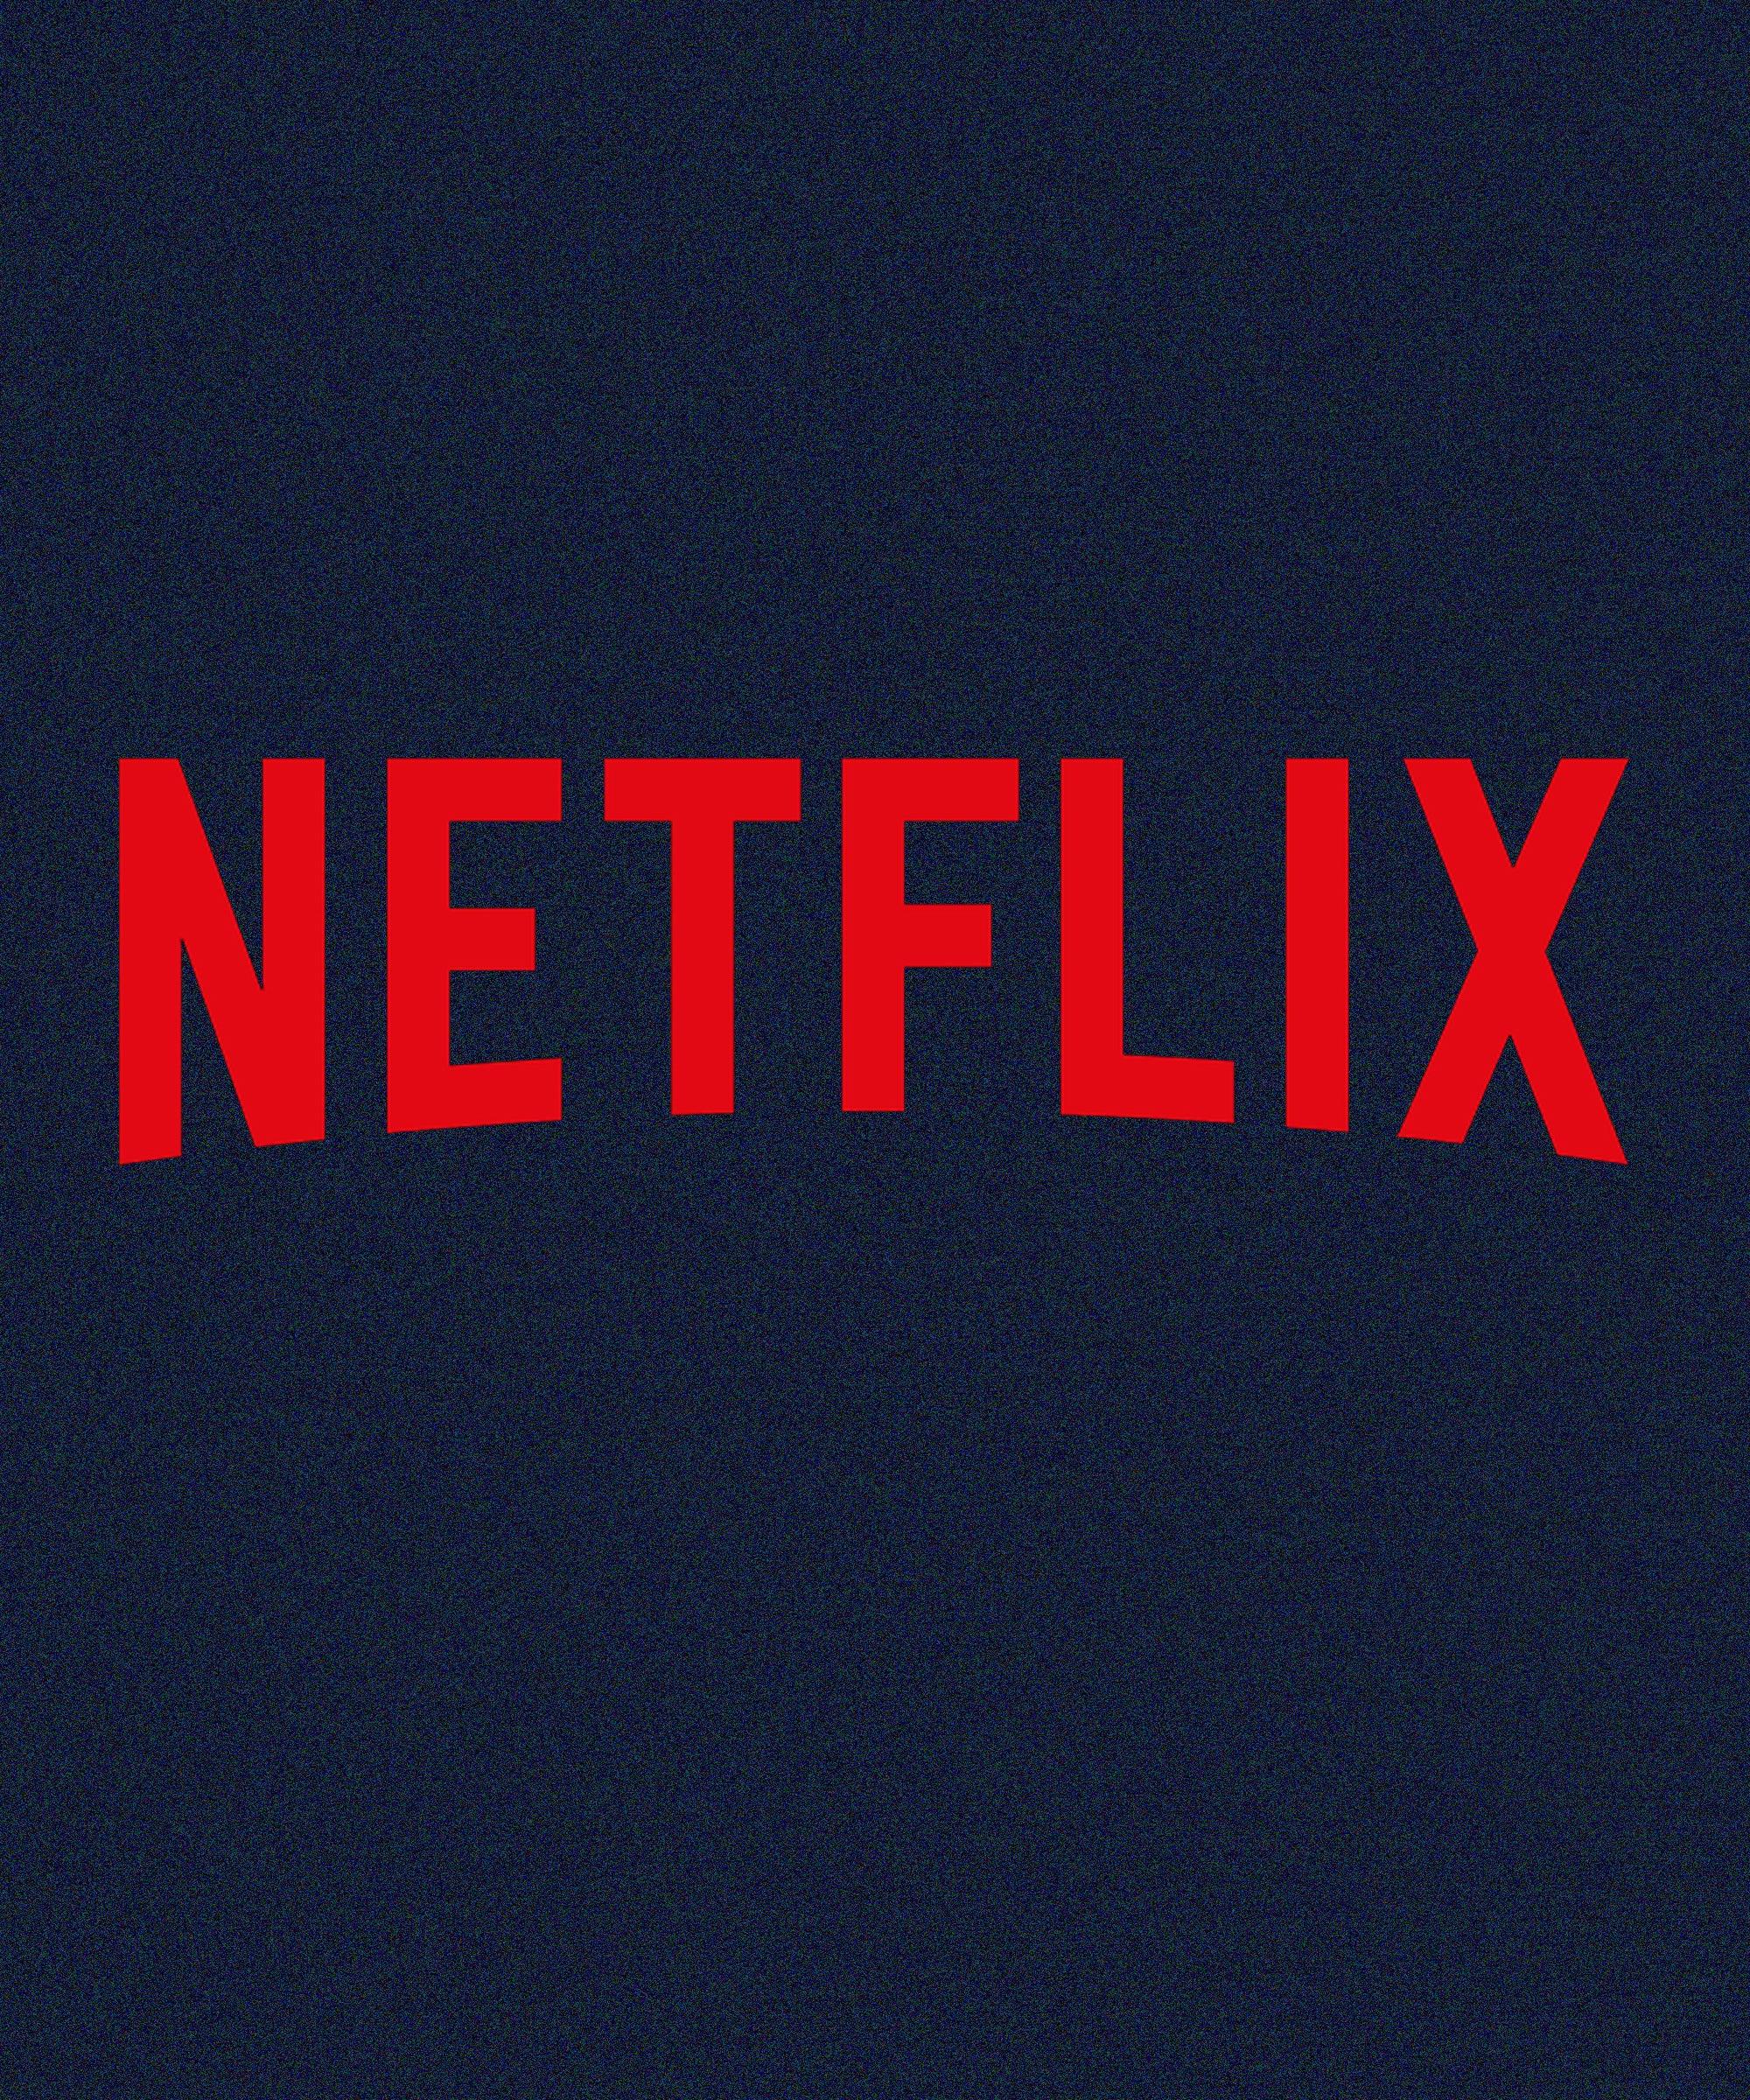 Netflix's New True Crime Series Is About A Disturbing Internet Manhunt